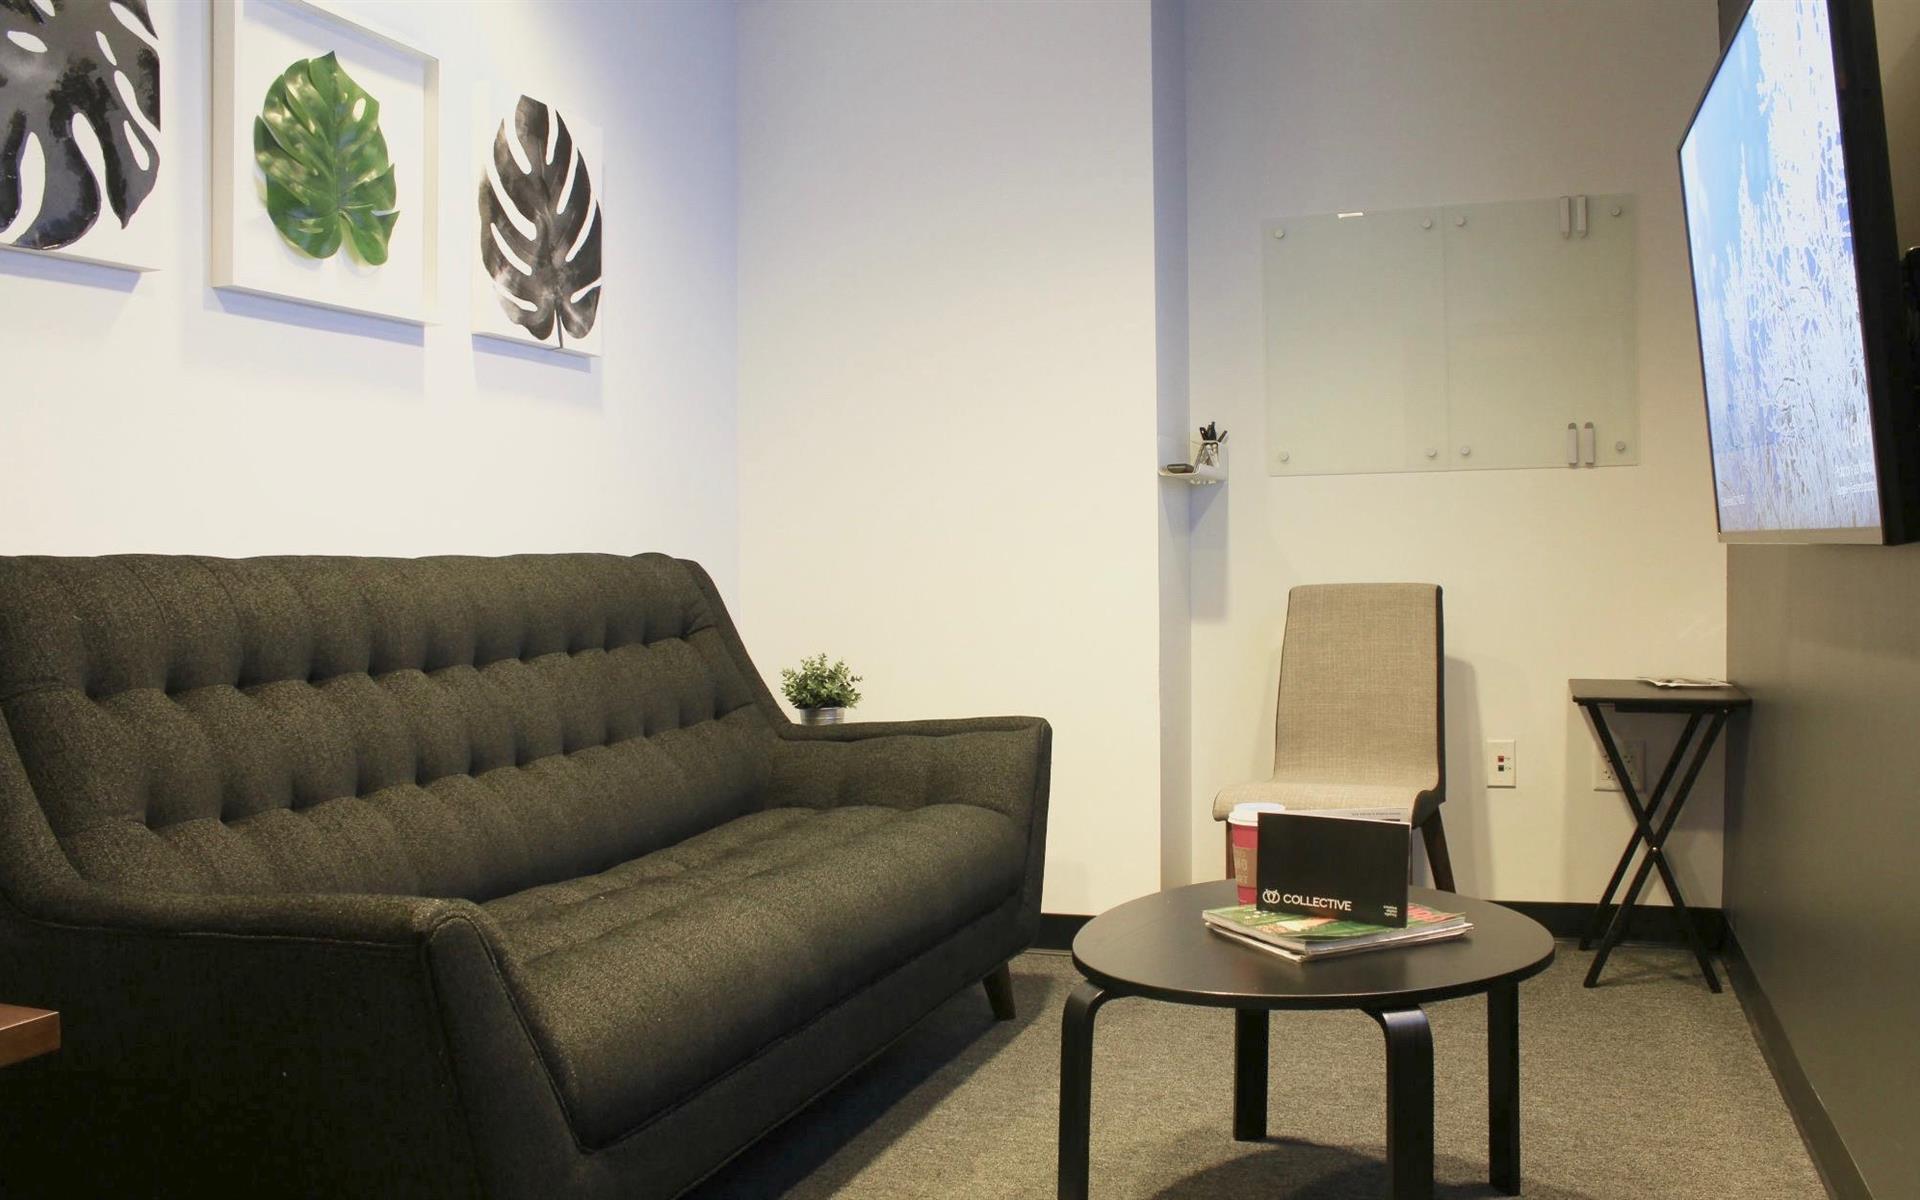 Collective Ventures Group LLC - Study Room